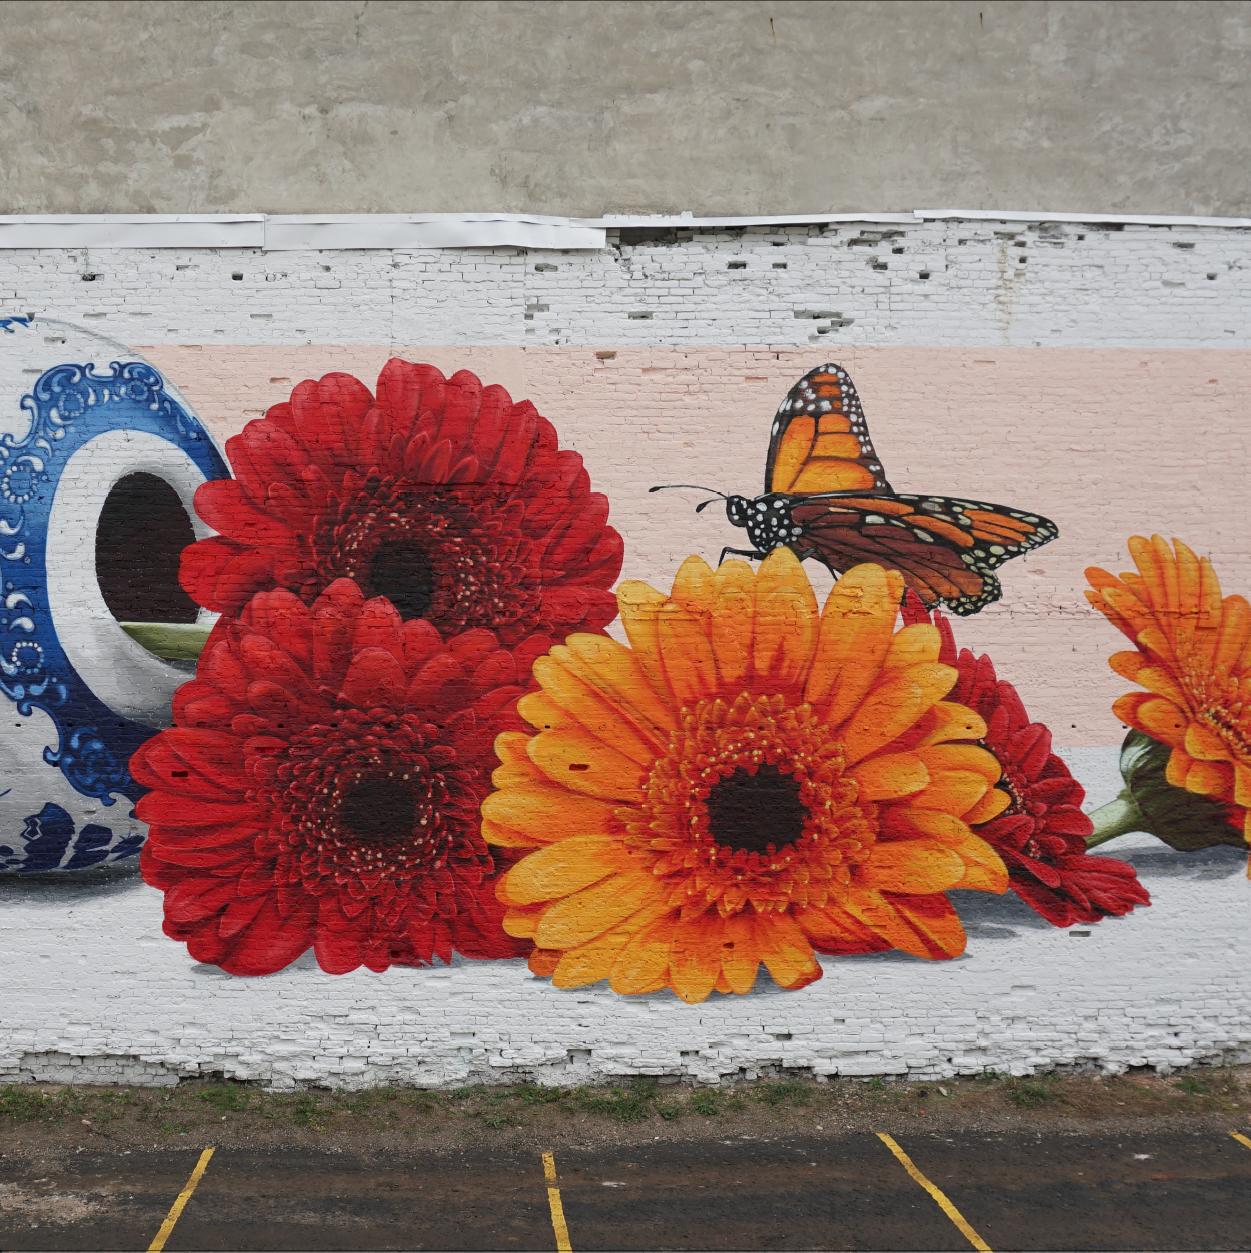 detail of Mural for Bright Walls mural fest, 2019